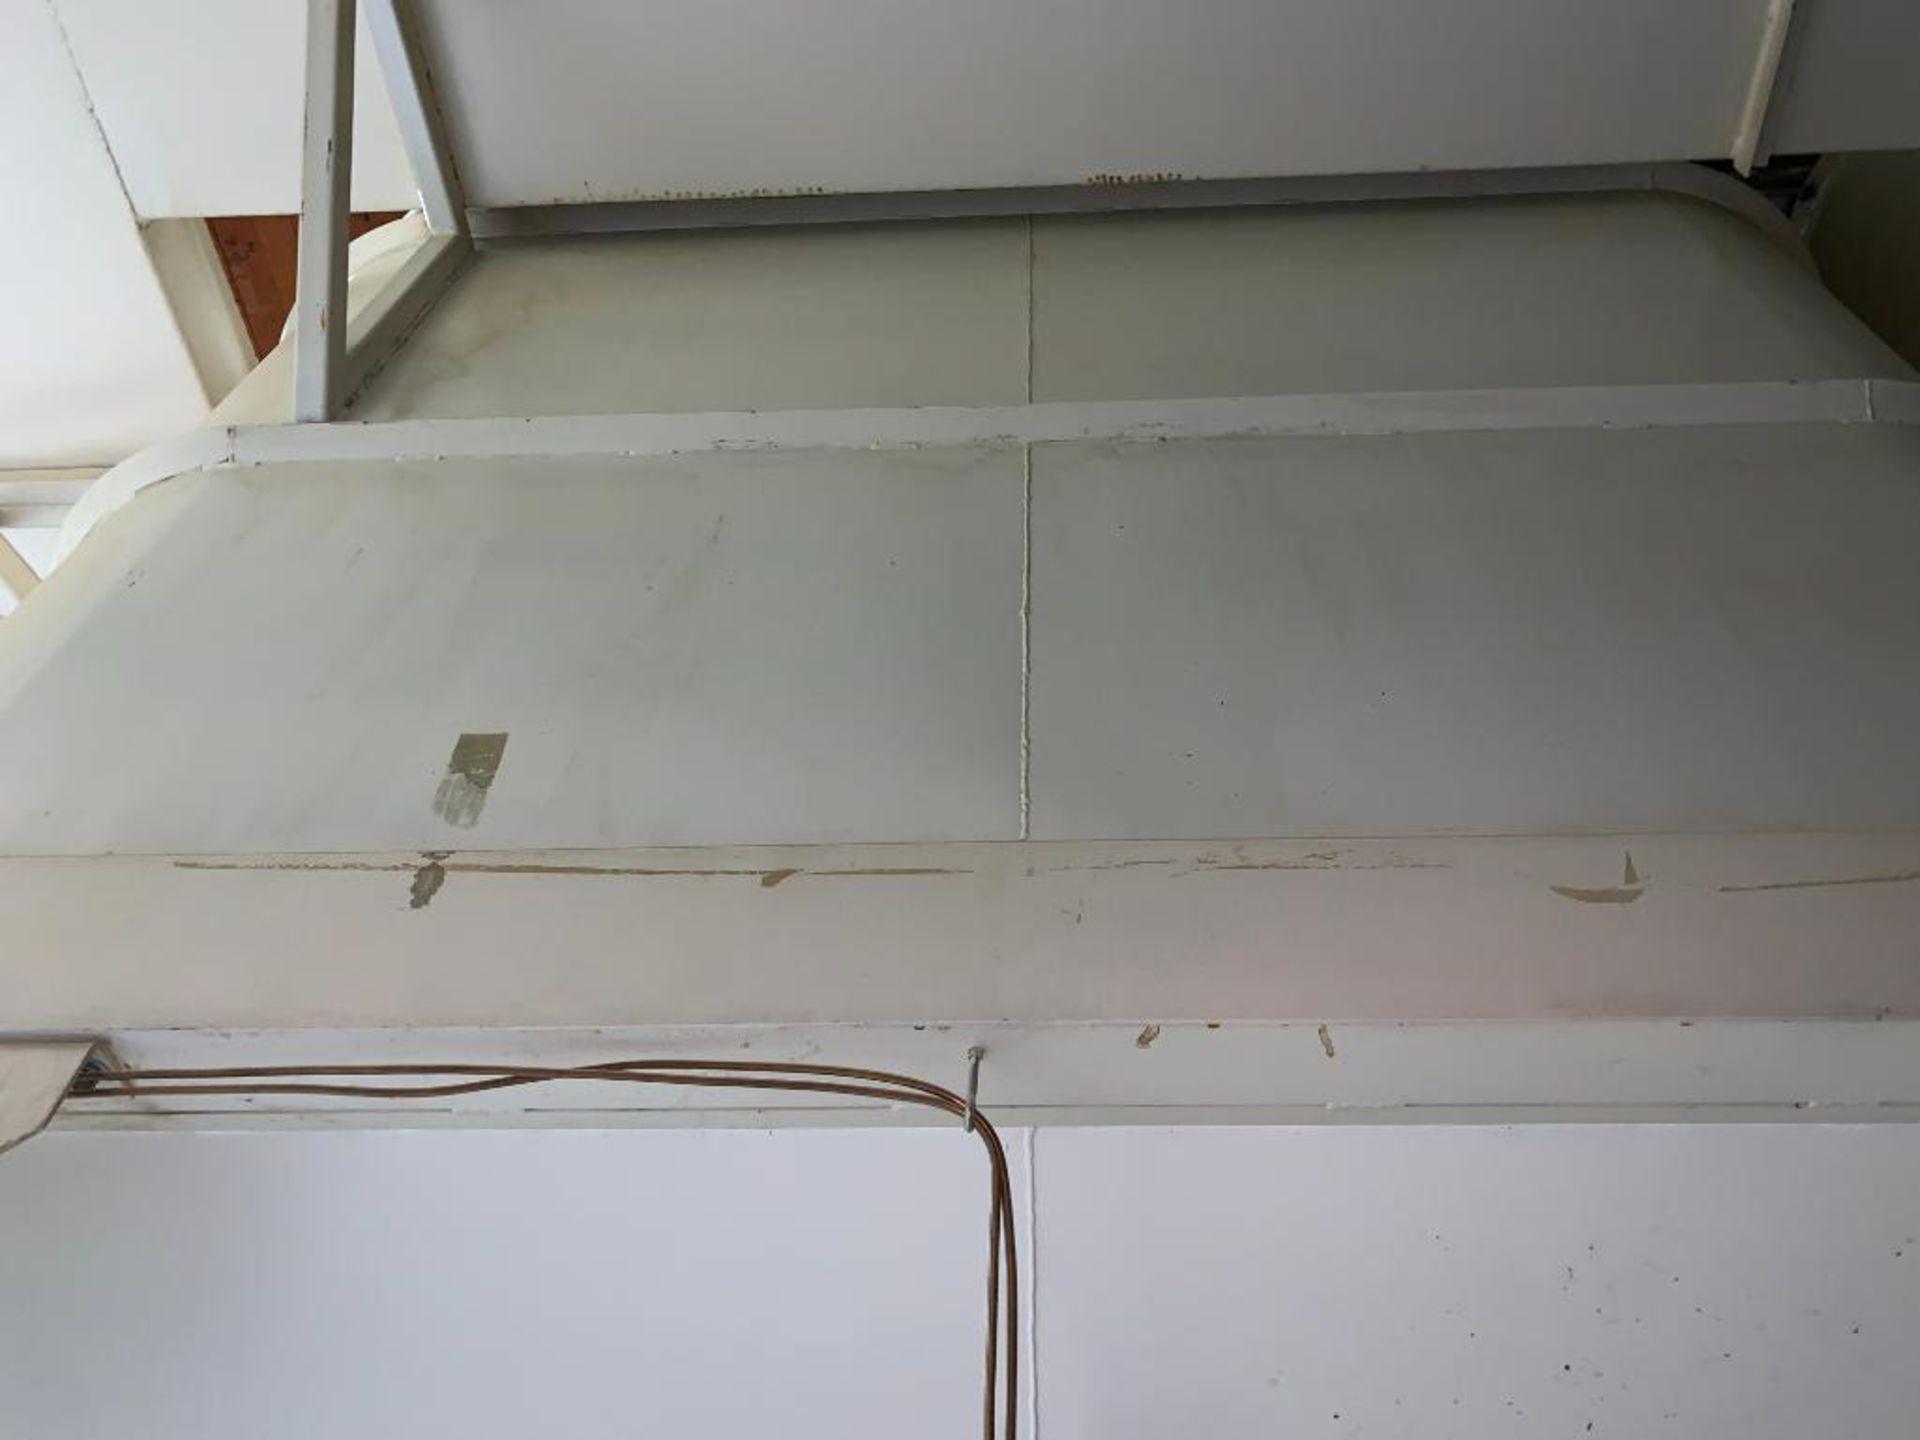 Aseeco mild steel cone bottom bulk storage bin - Image 15 of 16